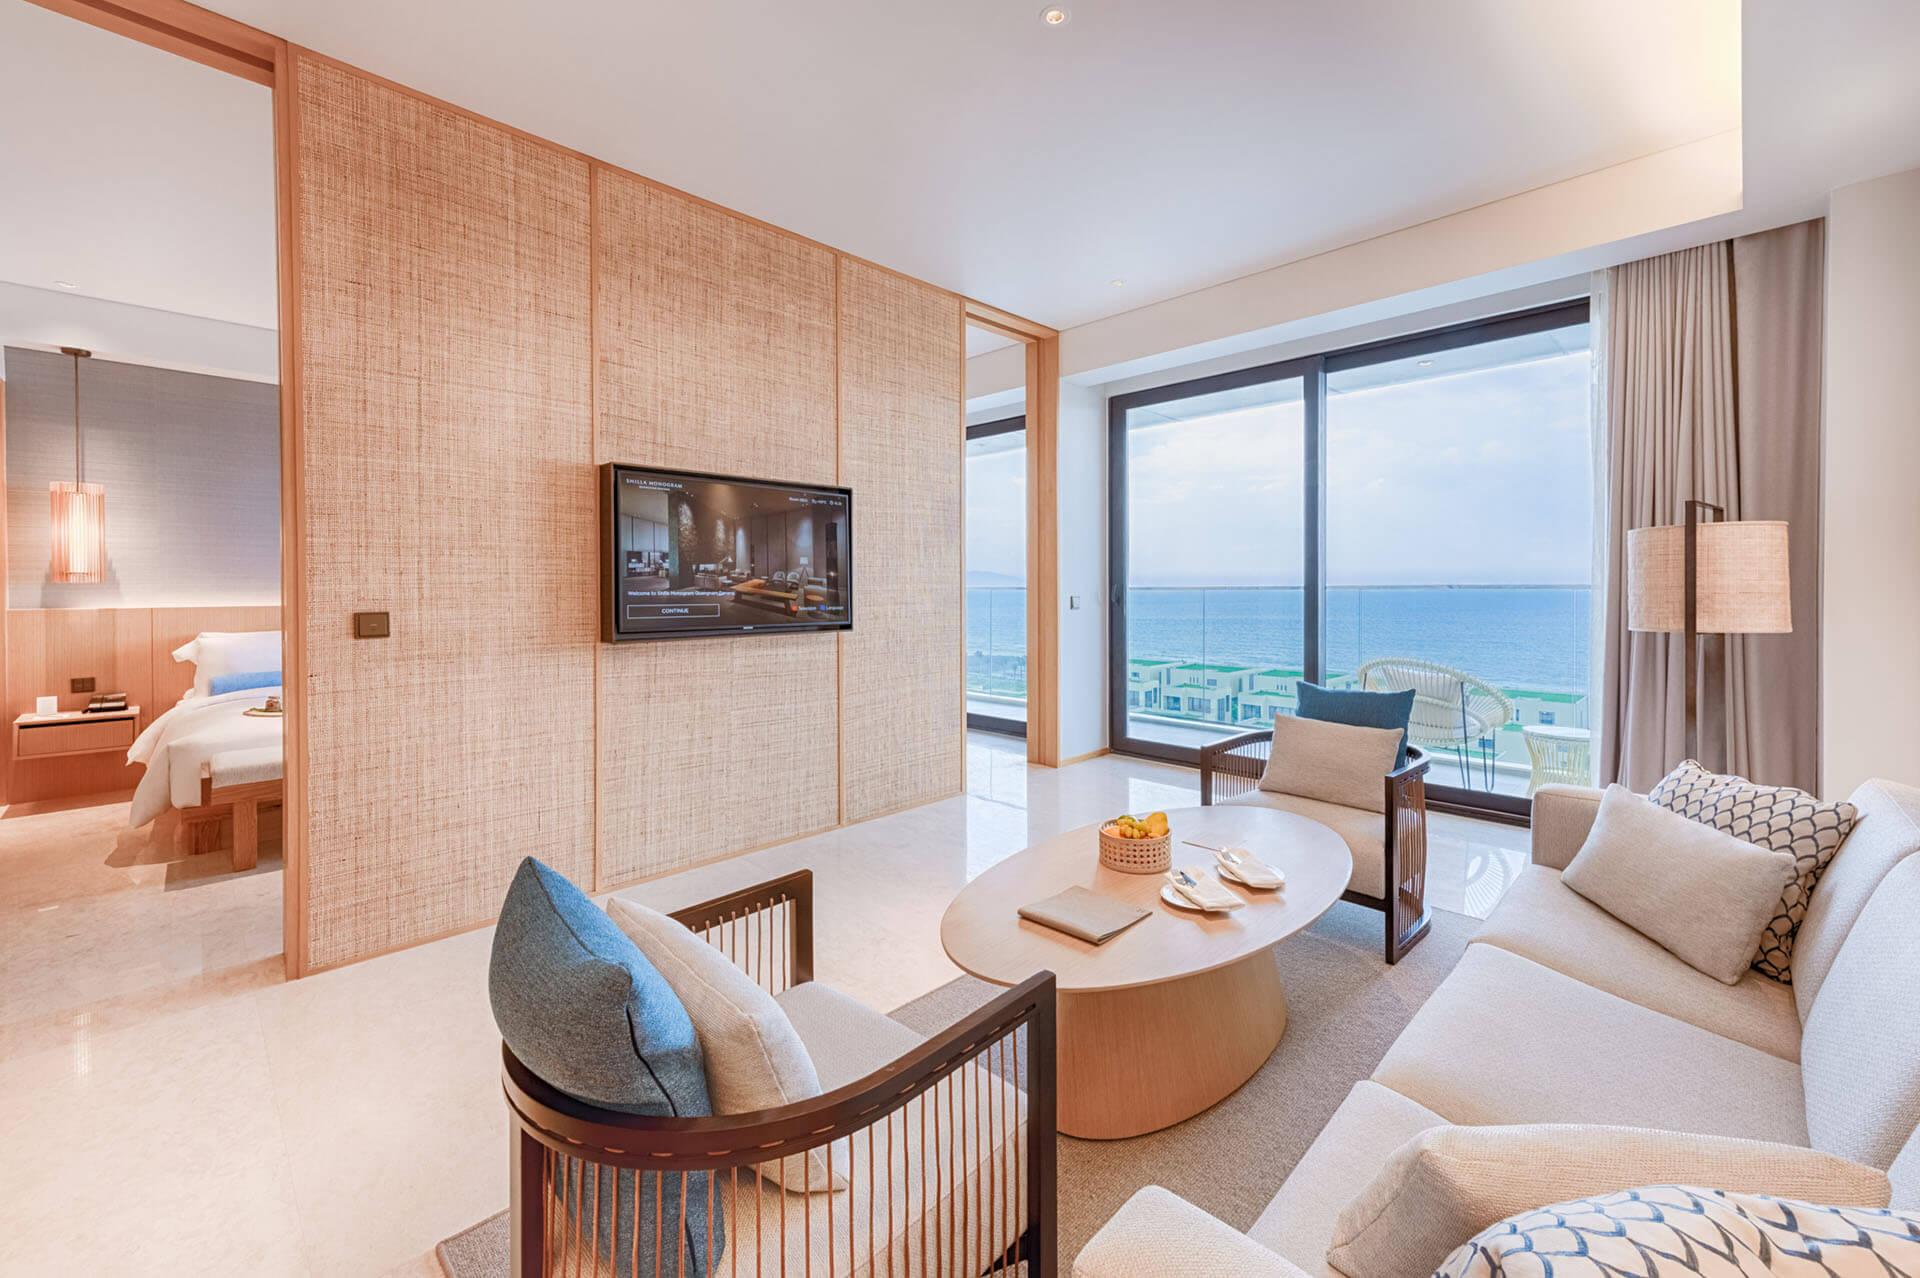 Shillamonogramdn Monogramsuite Livingroom